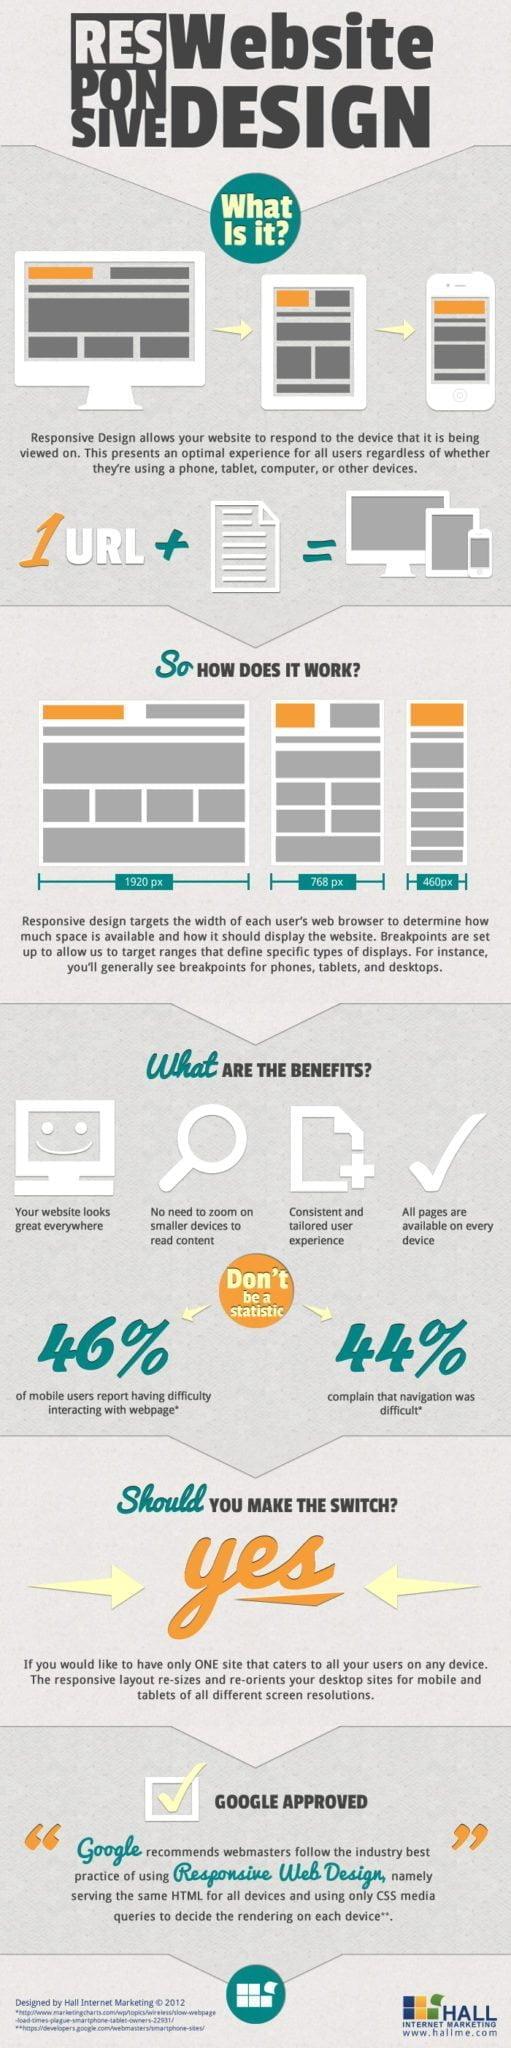 responsive design infographic